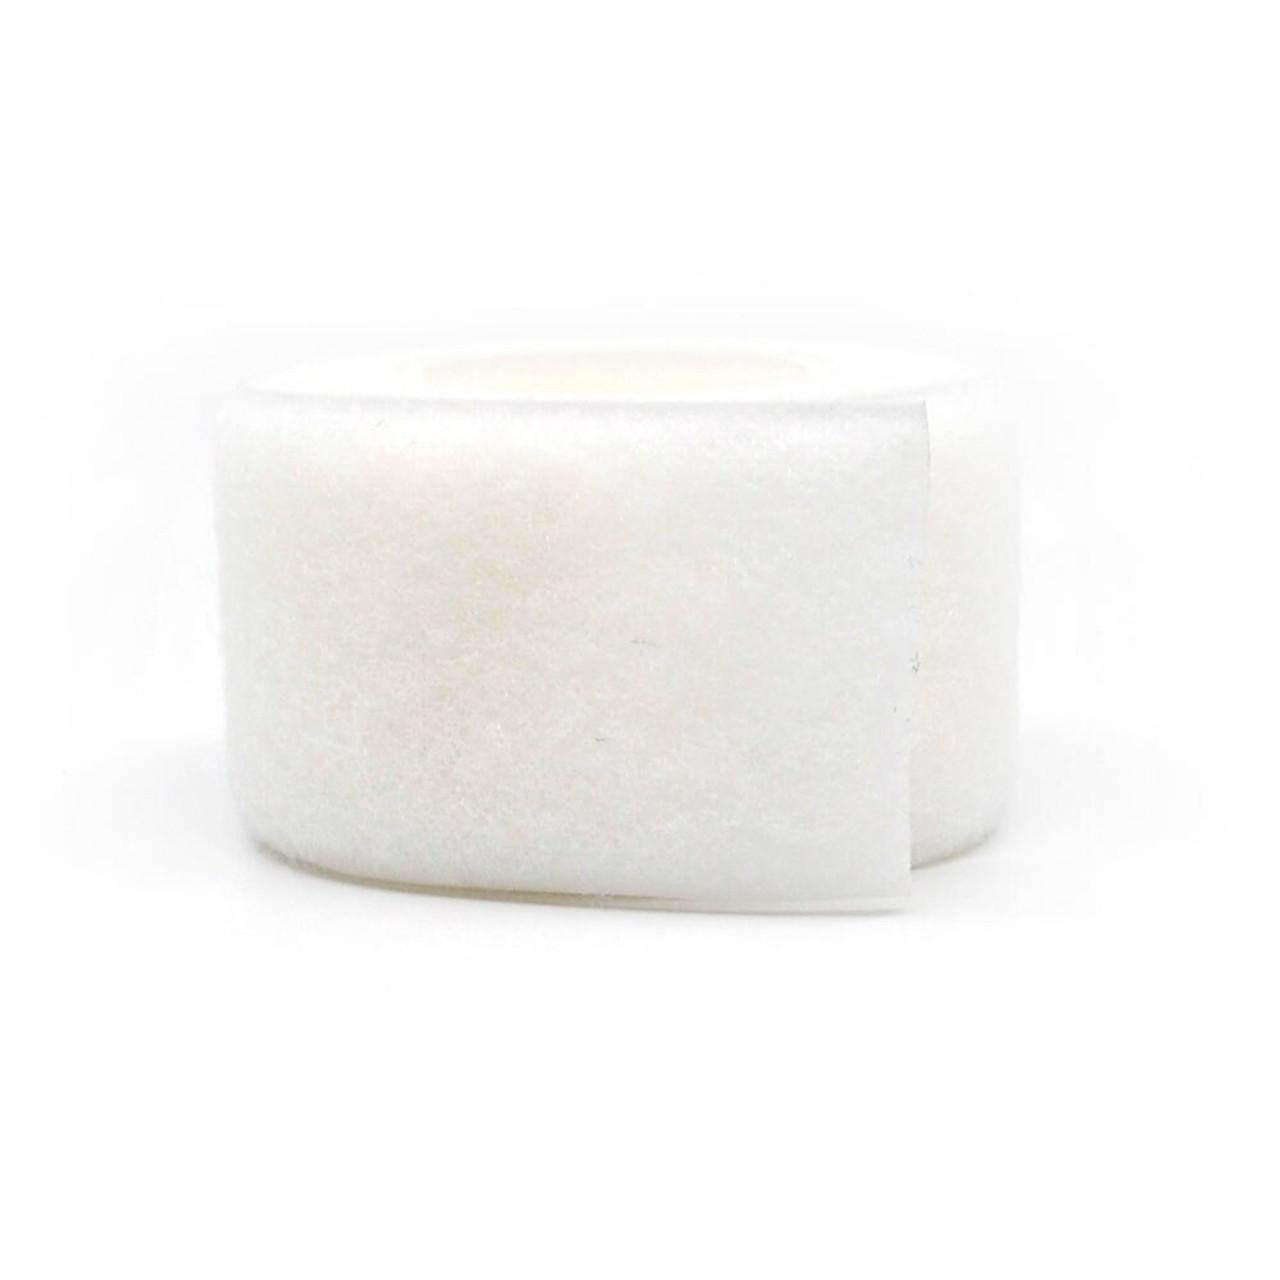 VELCRO® Brand Nylon Sew-On Tape White Loop / Velcro Fasteners